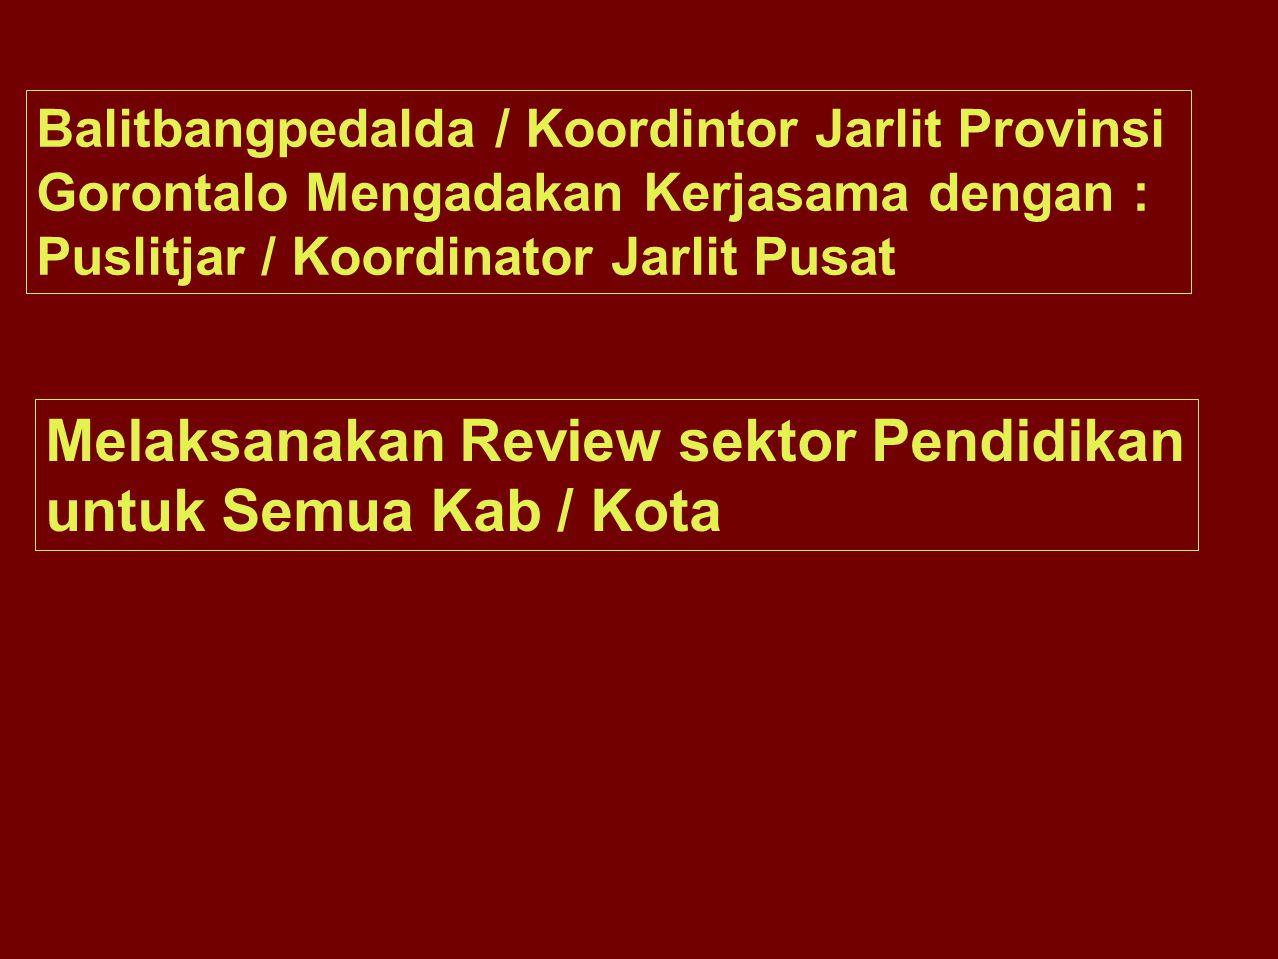 Balitbangpedalda / Koordintor Jarlit Provinsi Gorontalo Mengadakan Kerjasama dengan : Puslitjar / Koordinator Jarlit Pusat Melaksanakan Review sektor Pendidikan untuk Semua Kab / Kota